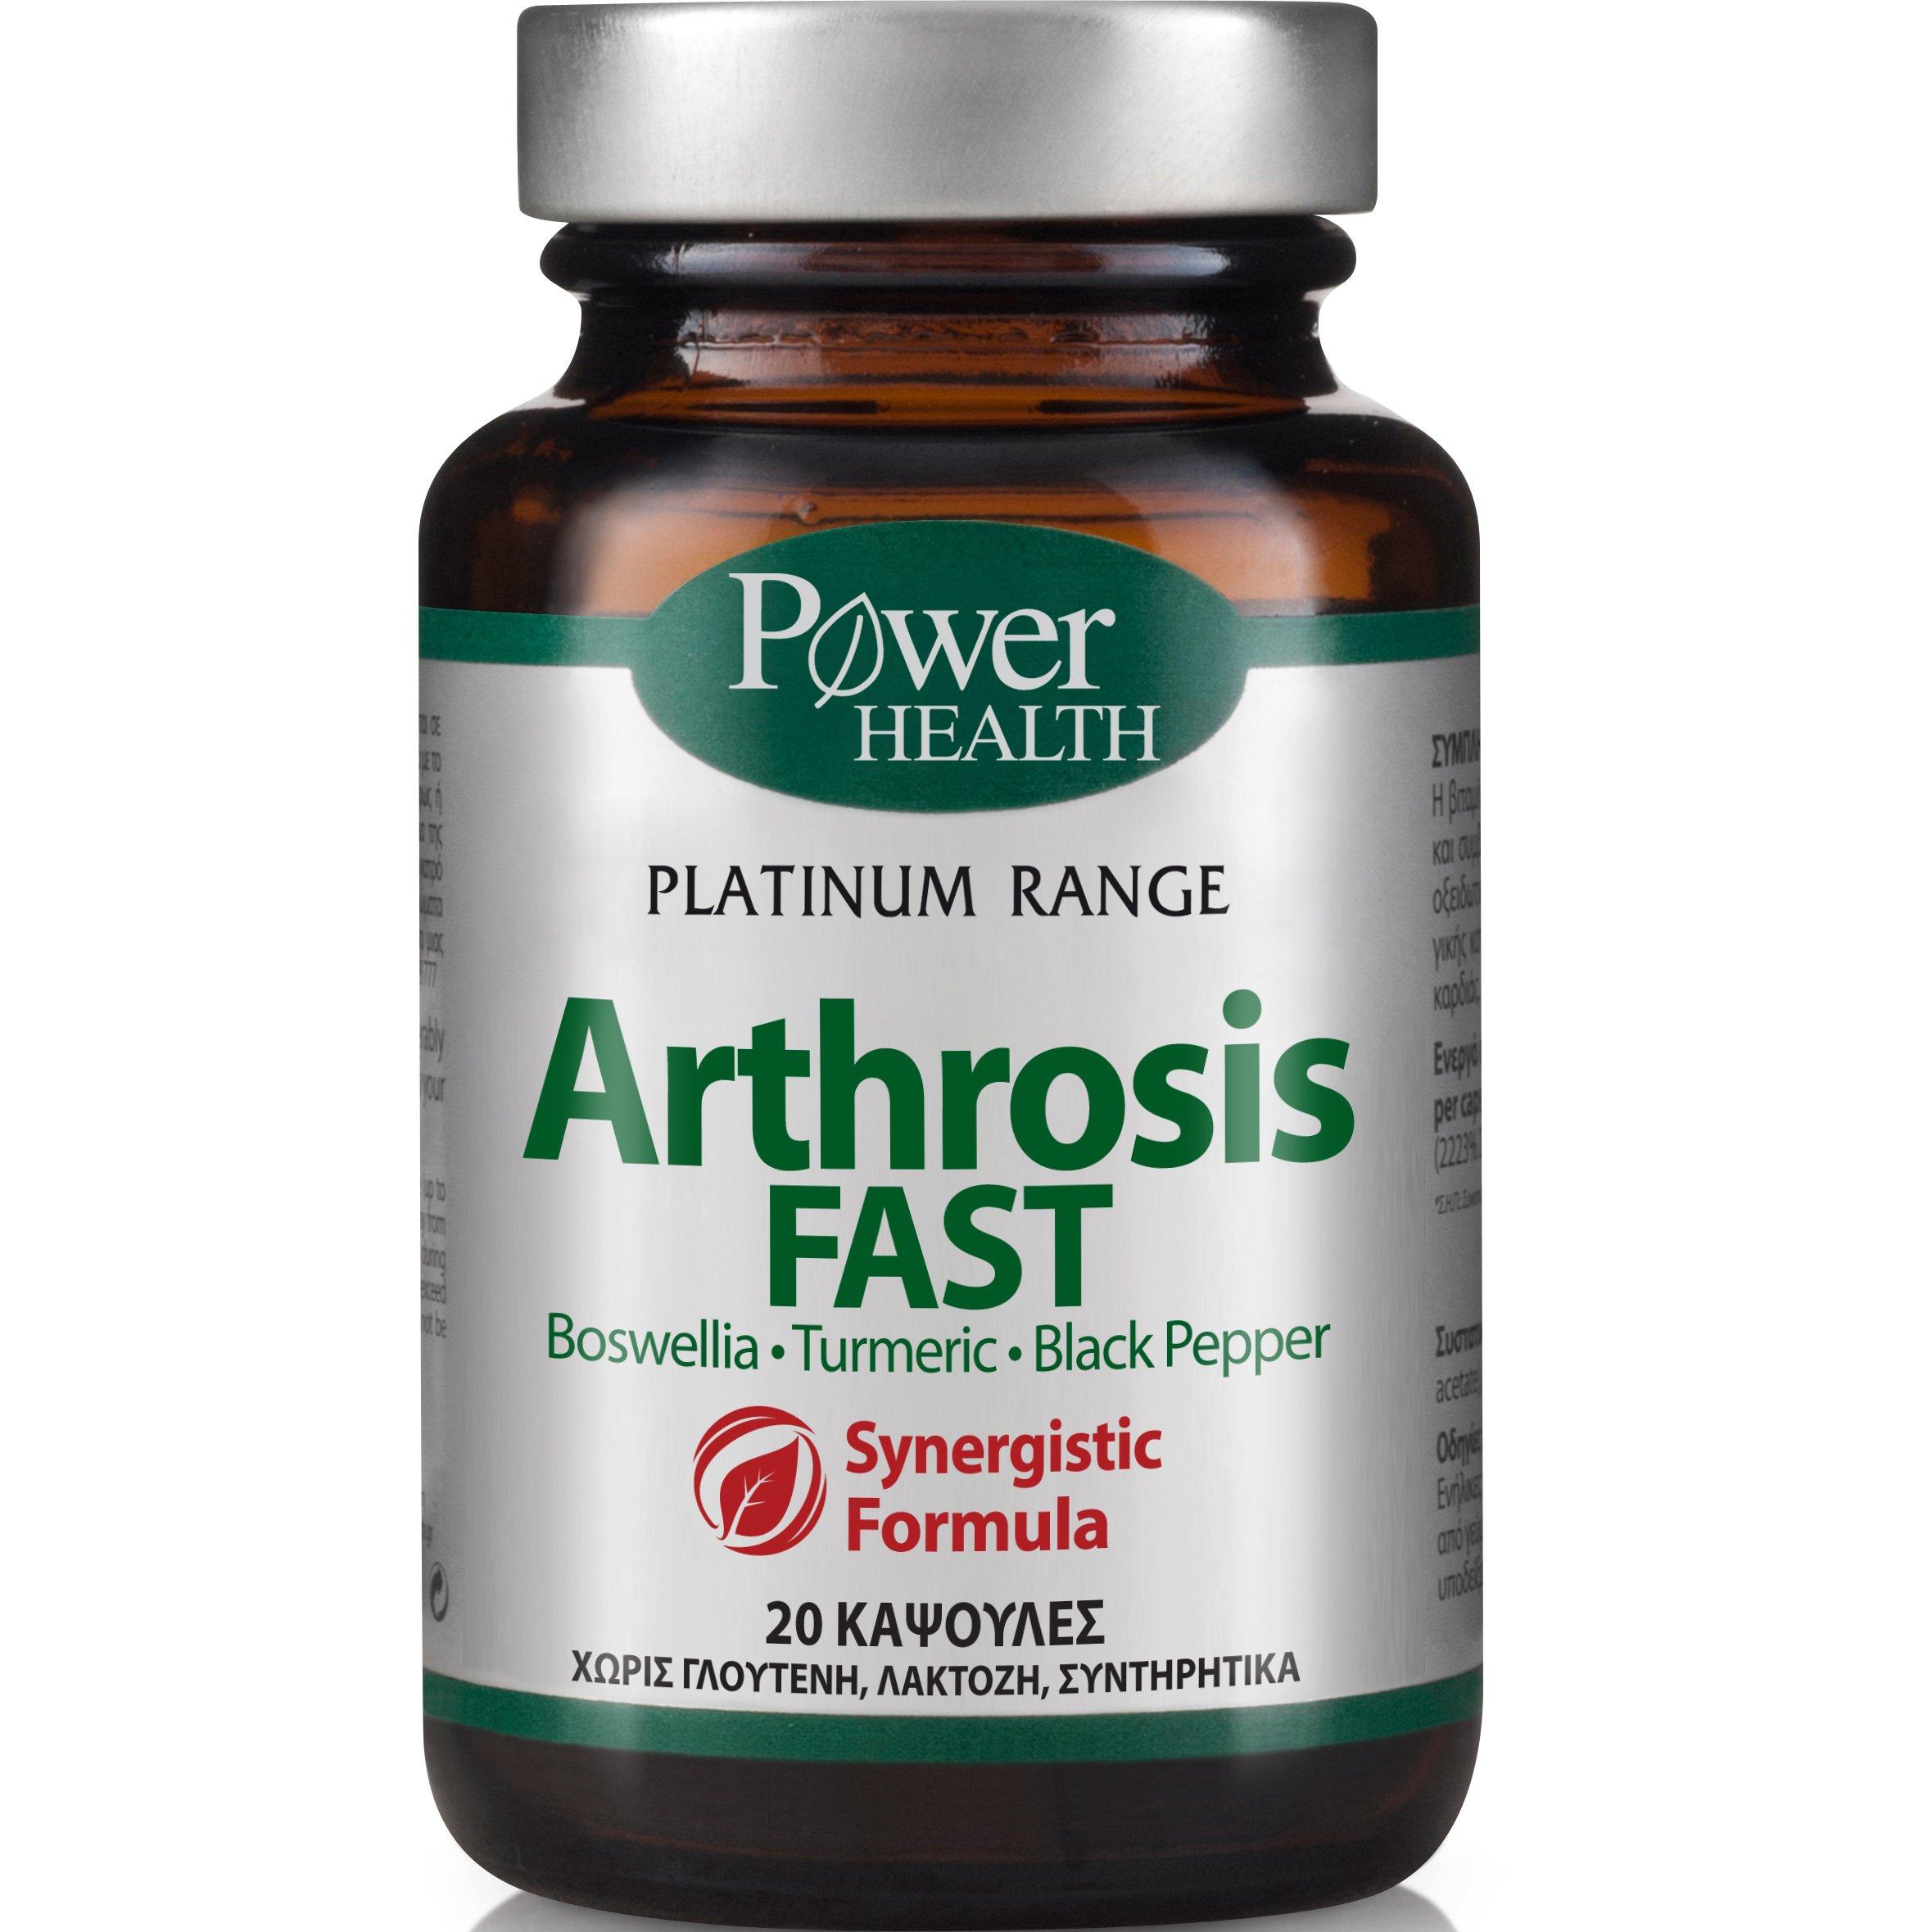 Power Health Platinum Arthrosis Fast Φυσικό ΠαυσίπονοΆμεσης Ανακούφισηςστις Έντονες Ενοχλήσεις των Αρθρώσεων 20caps